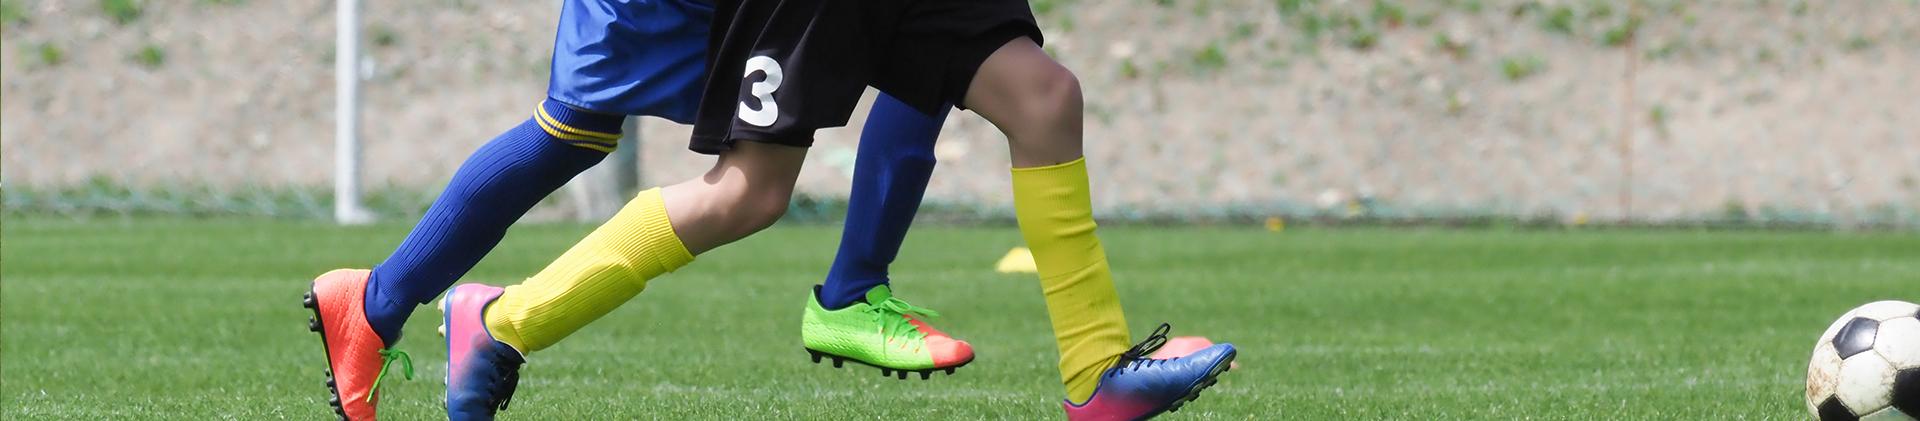 recreational-soccer